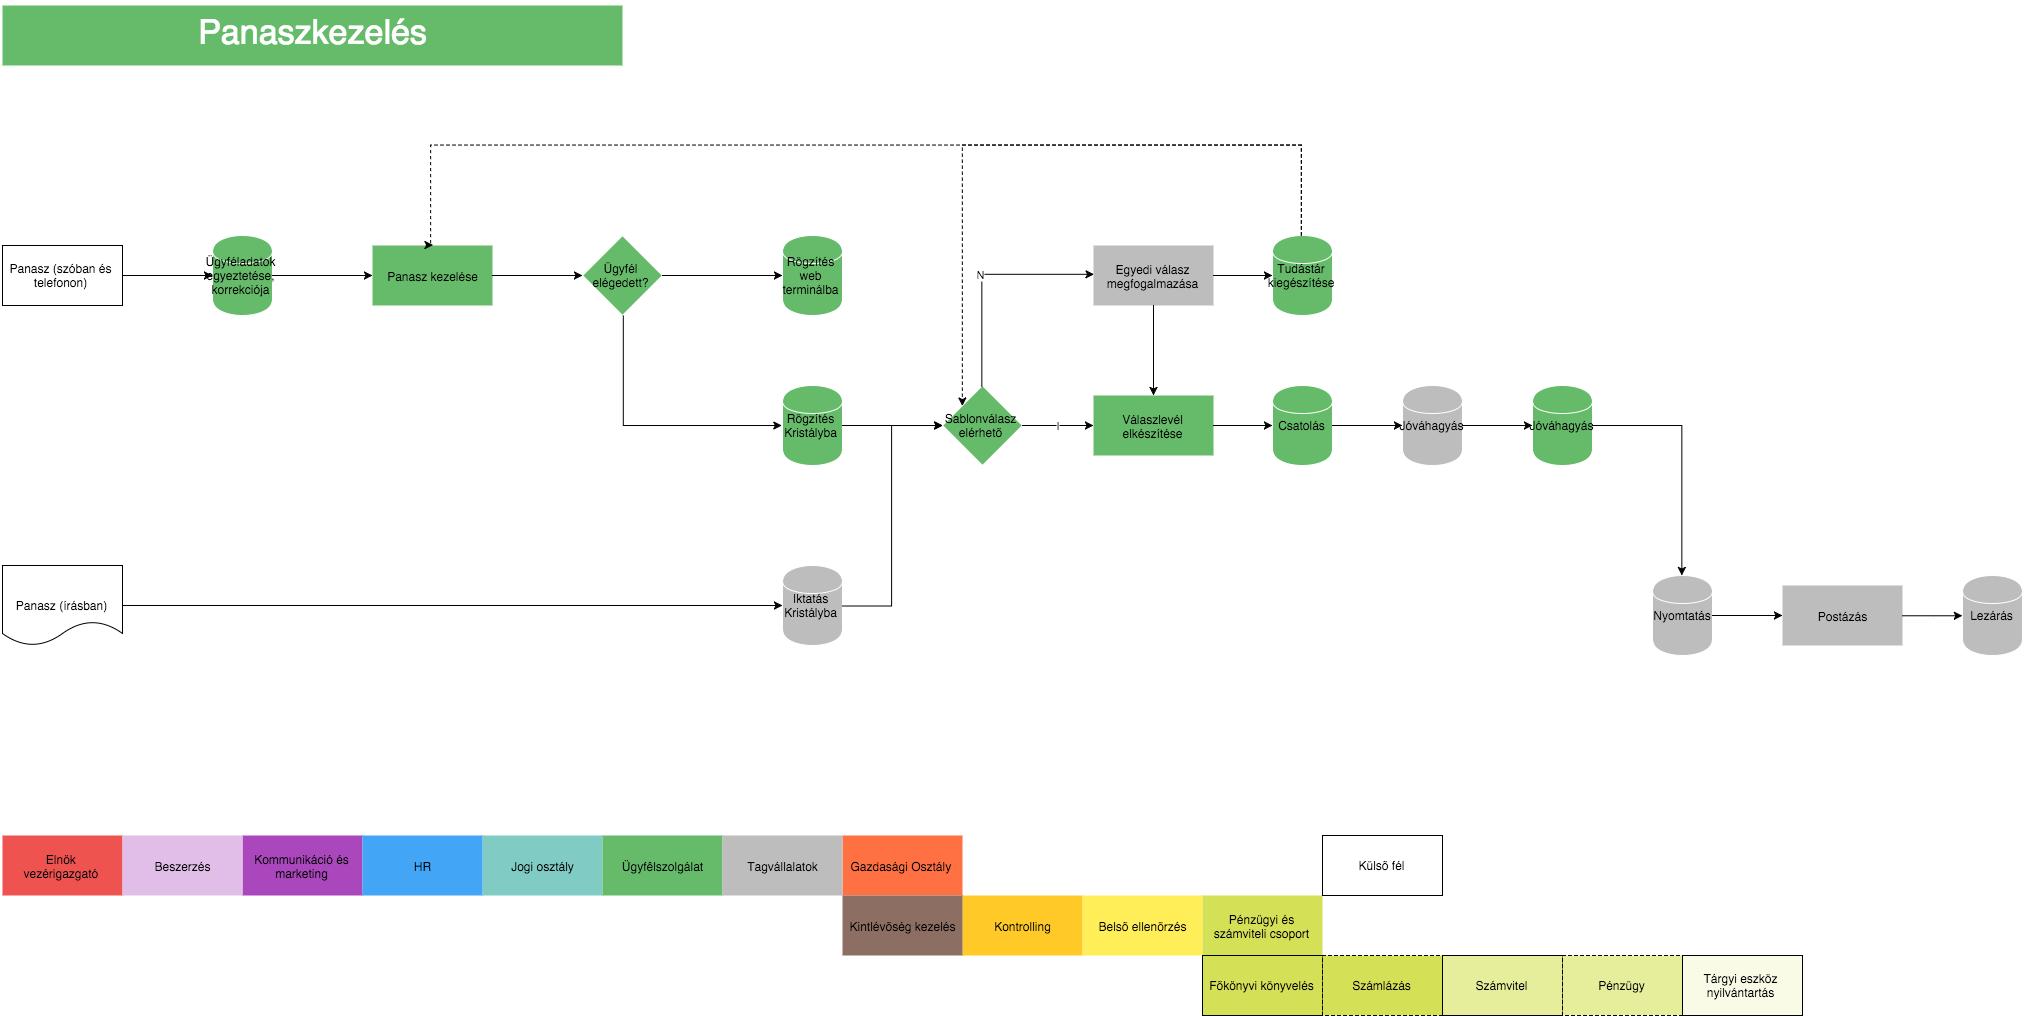 8d process flow diagram 005543 8d process flow diagram wiring resources  005543 8d process flow diagram wiring